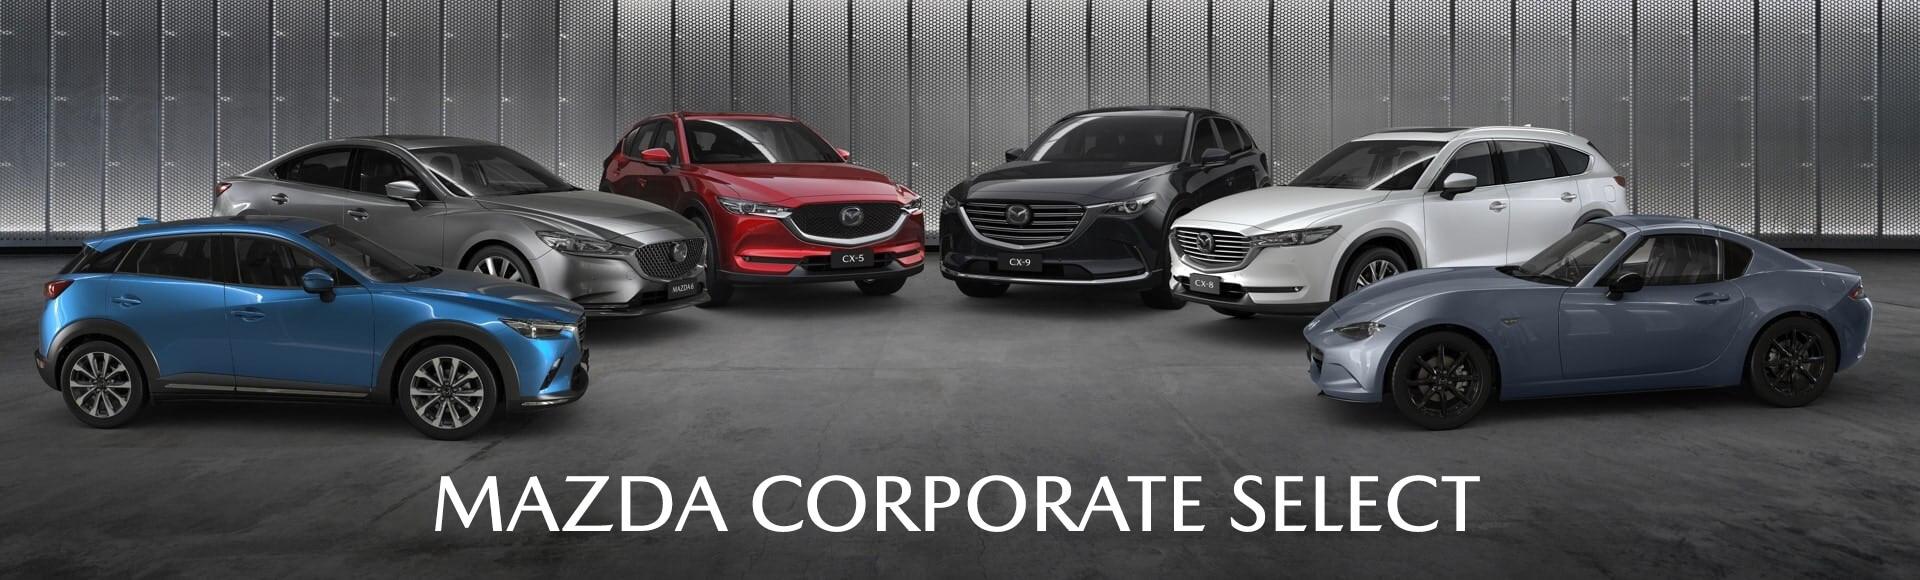 Mazda Corporate Select